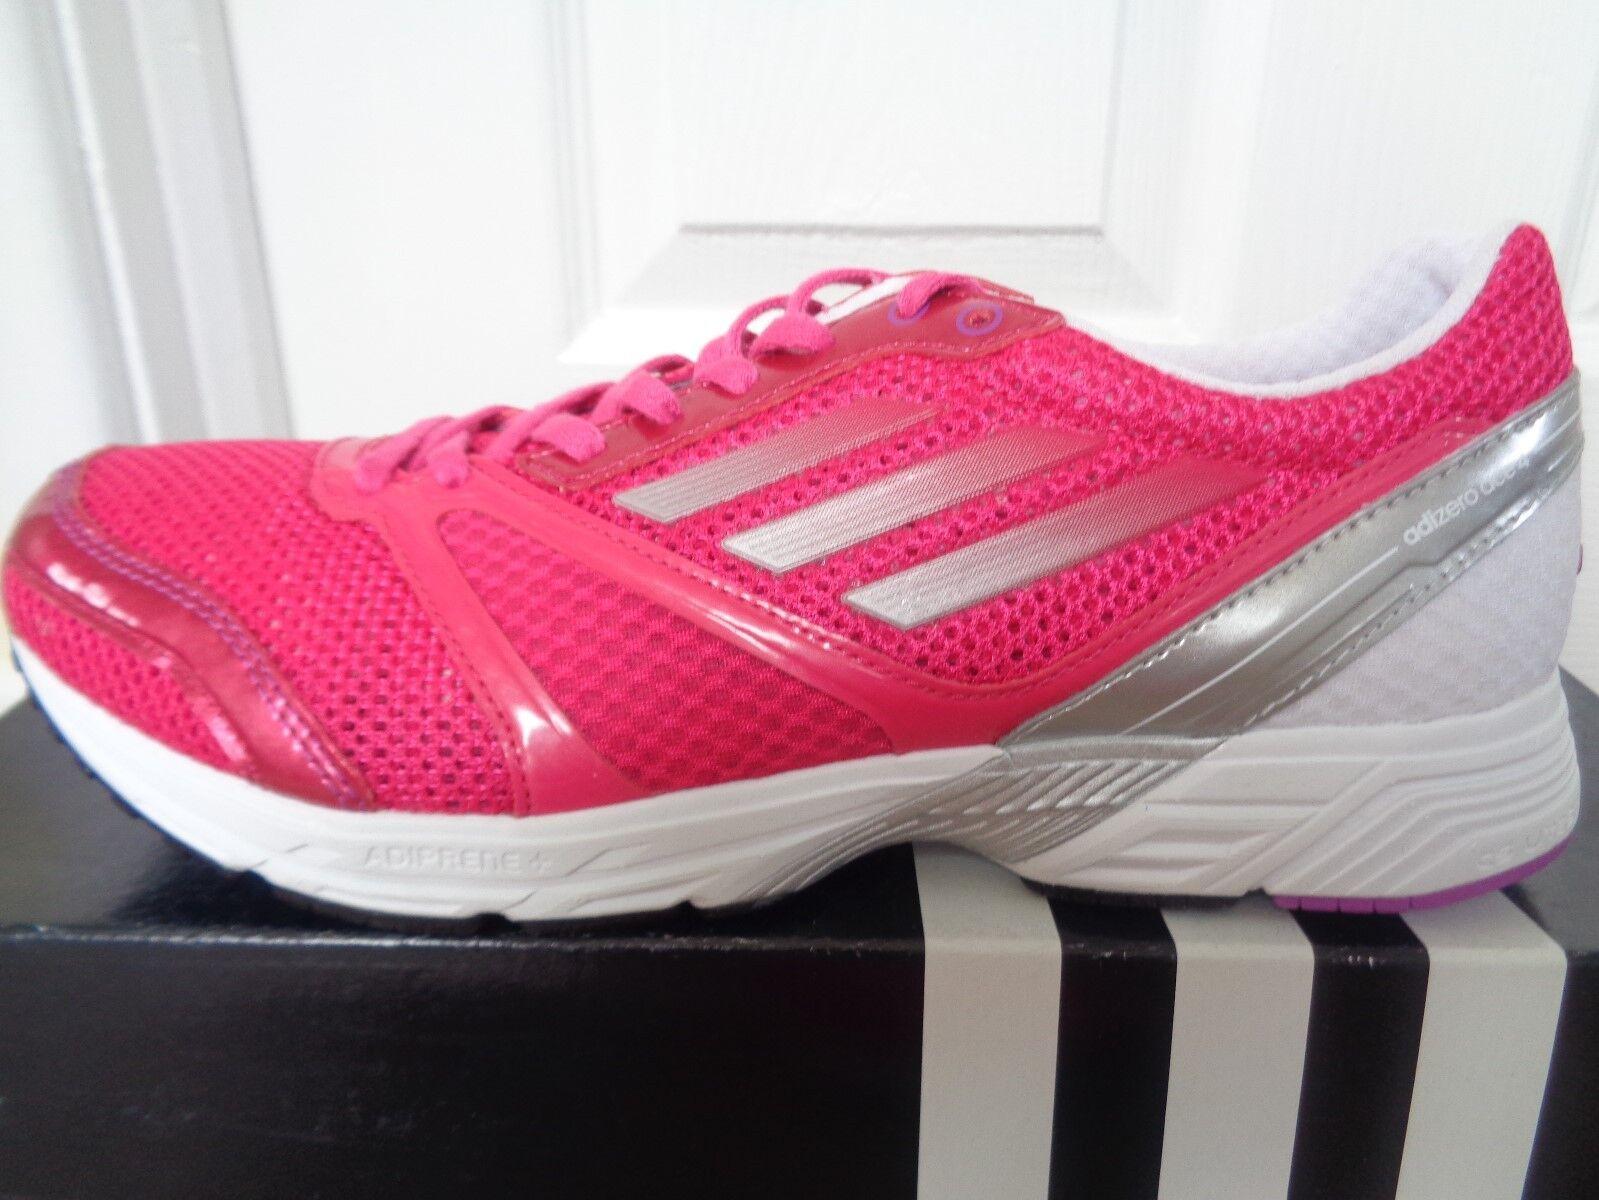 Adidas Adizero Femme trainers Baskets G61219 uk us 7 eu 40 2/3 us uk 8.5 NEWBOX b4b3ef